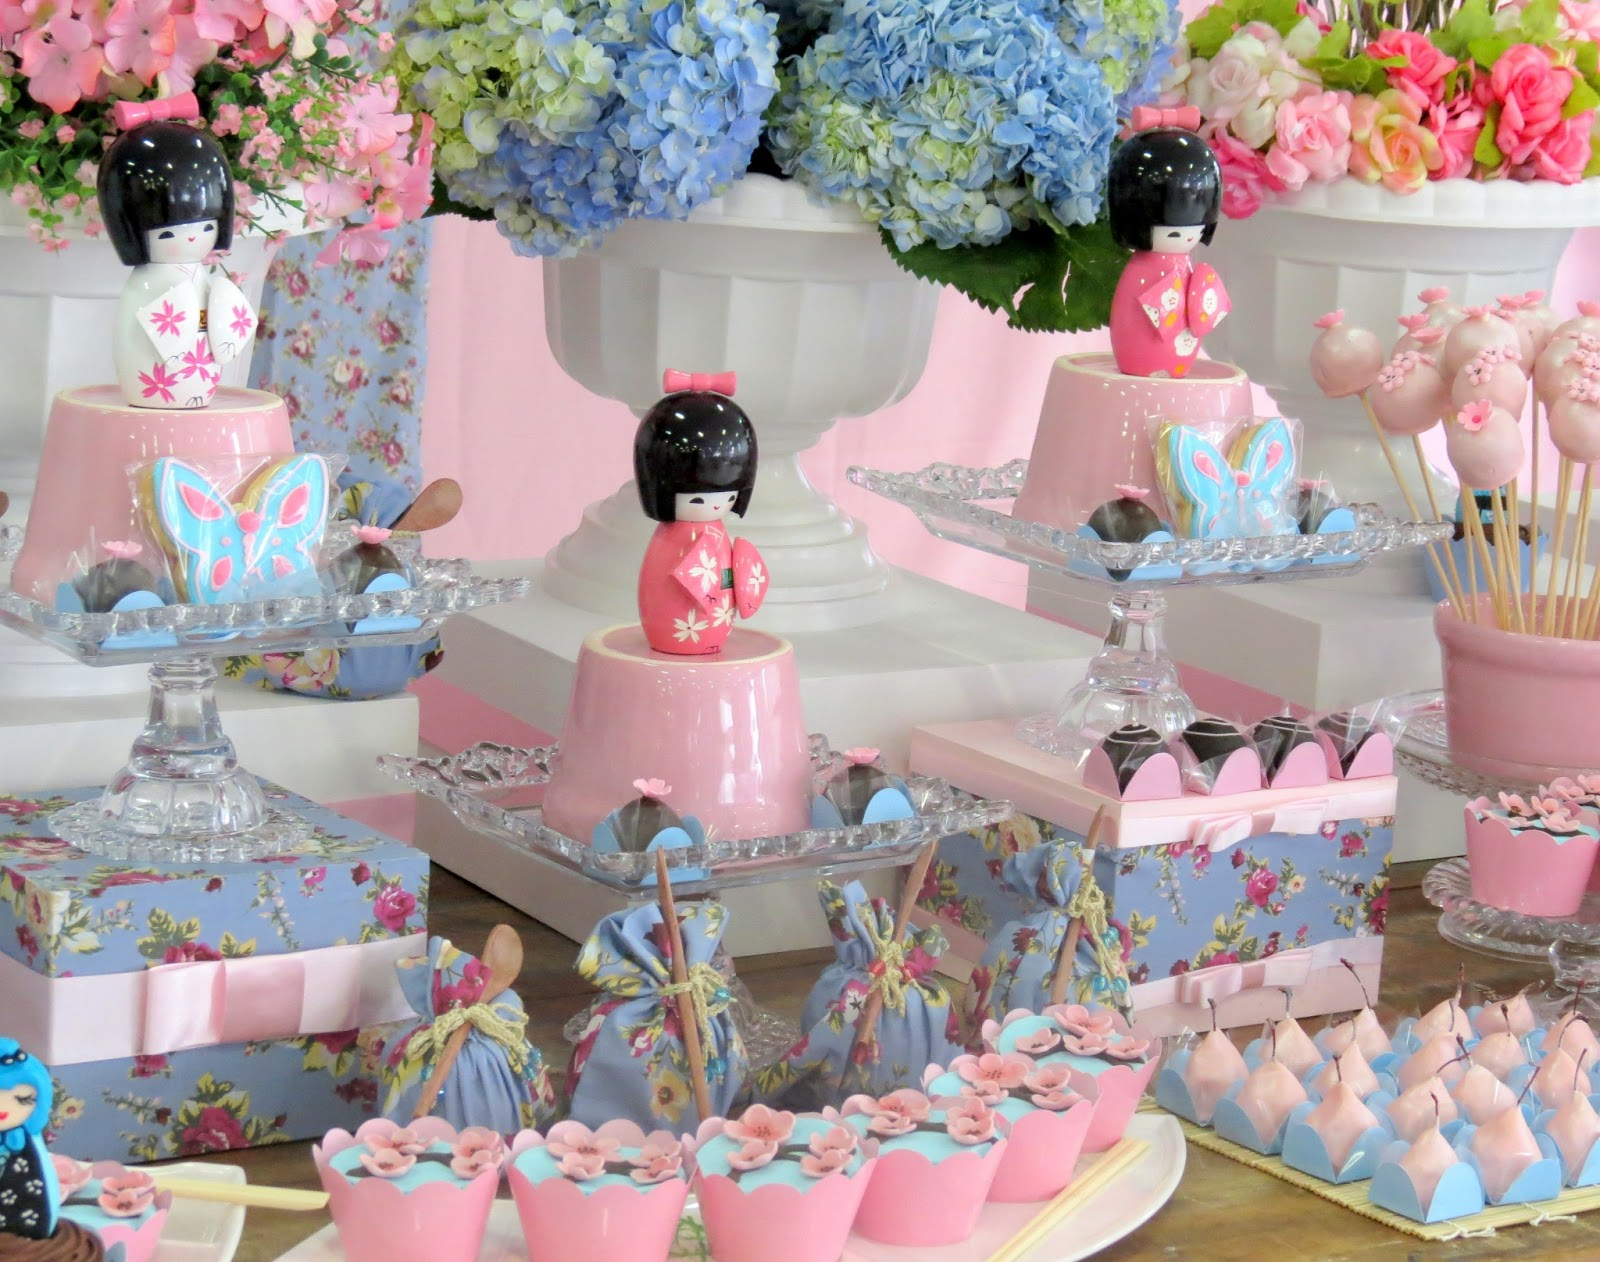 festa jardim japones : festa jardim japones:Festa Provençal – Site Oficial: Jardim de Japonês!!